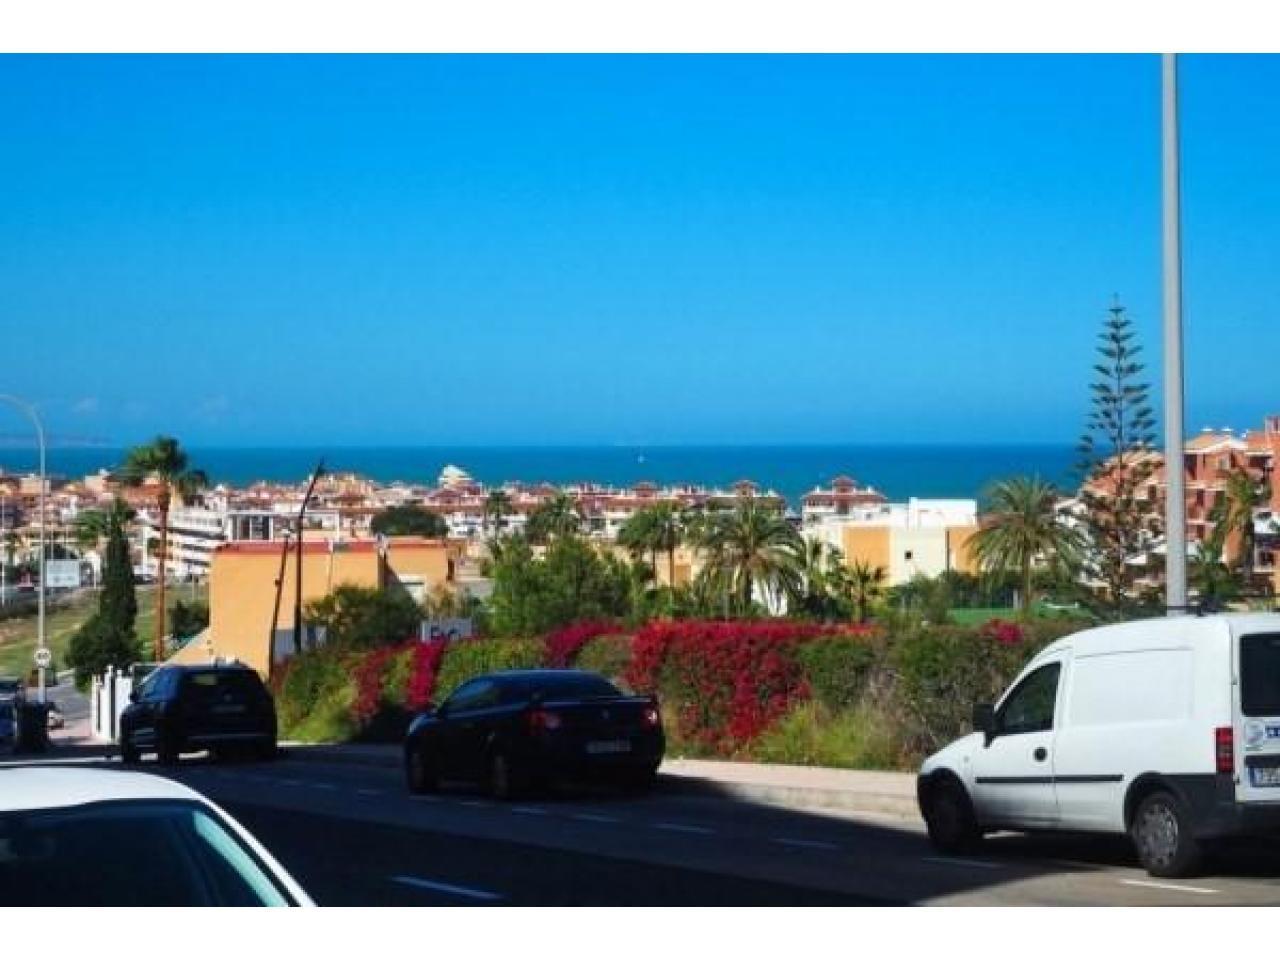 Недвижимость в Испании, Квартира c видами на море в Торревьеха,Коста Бланка,Испания - 1